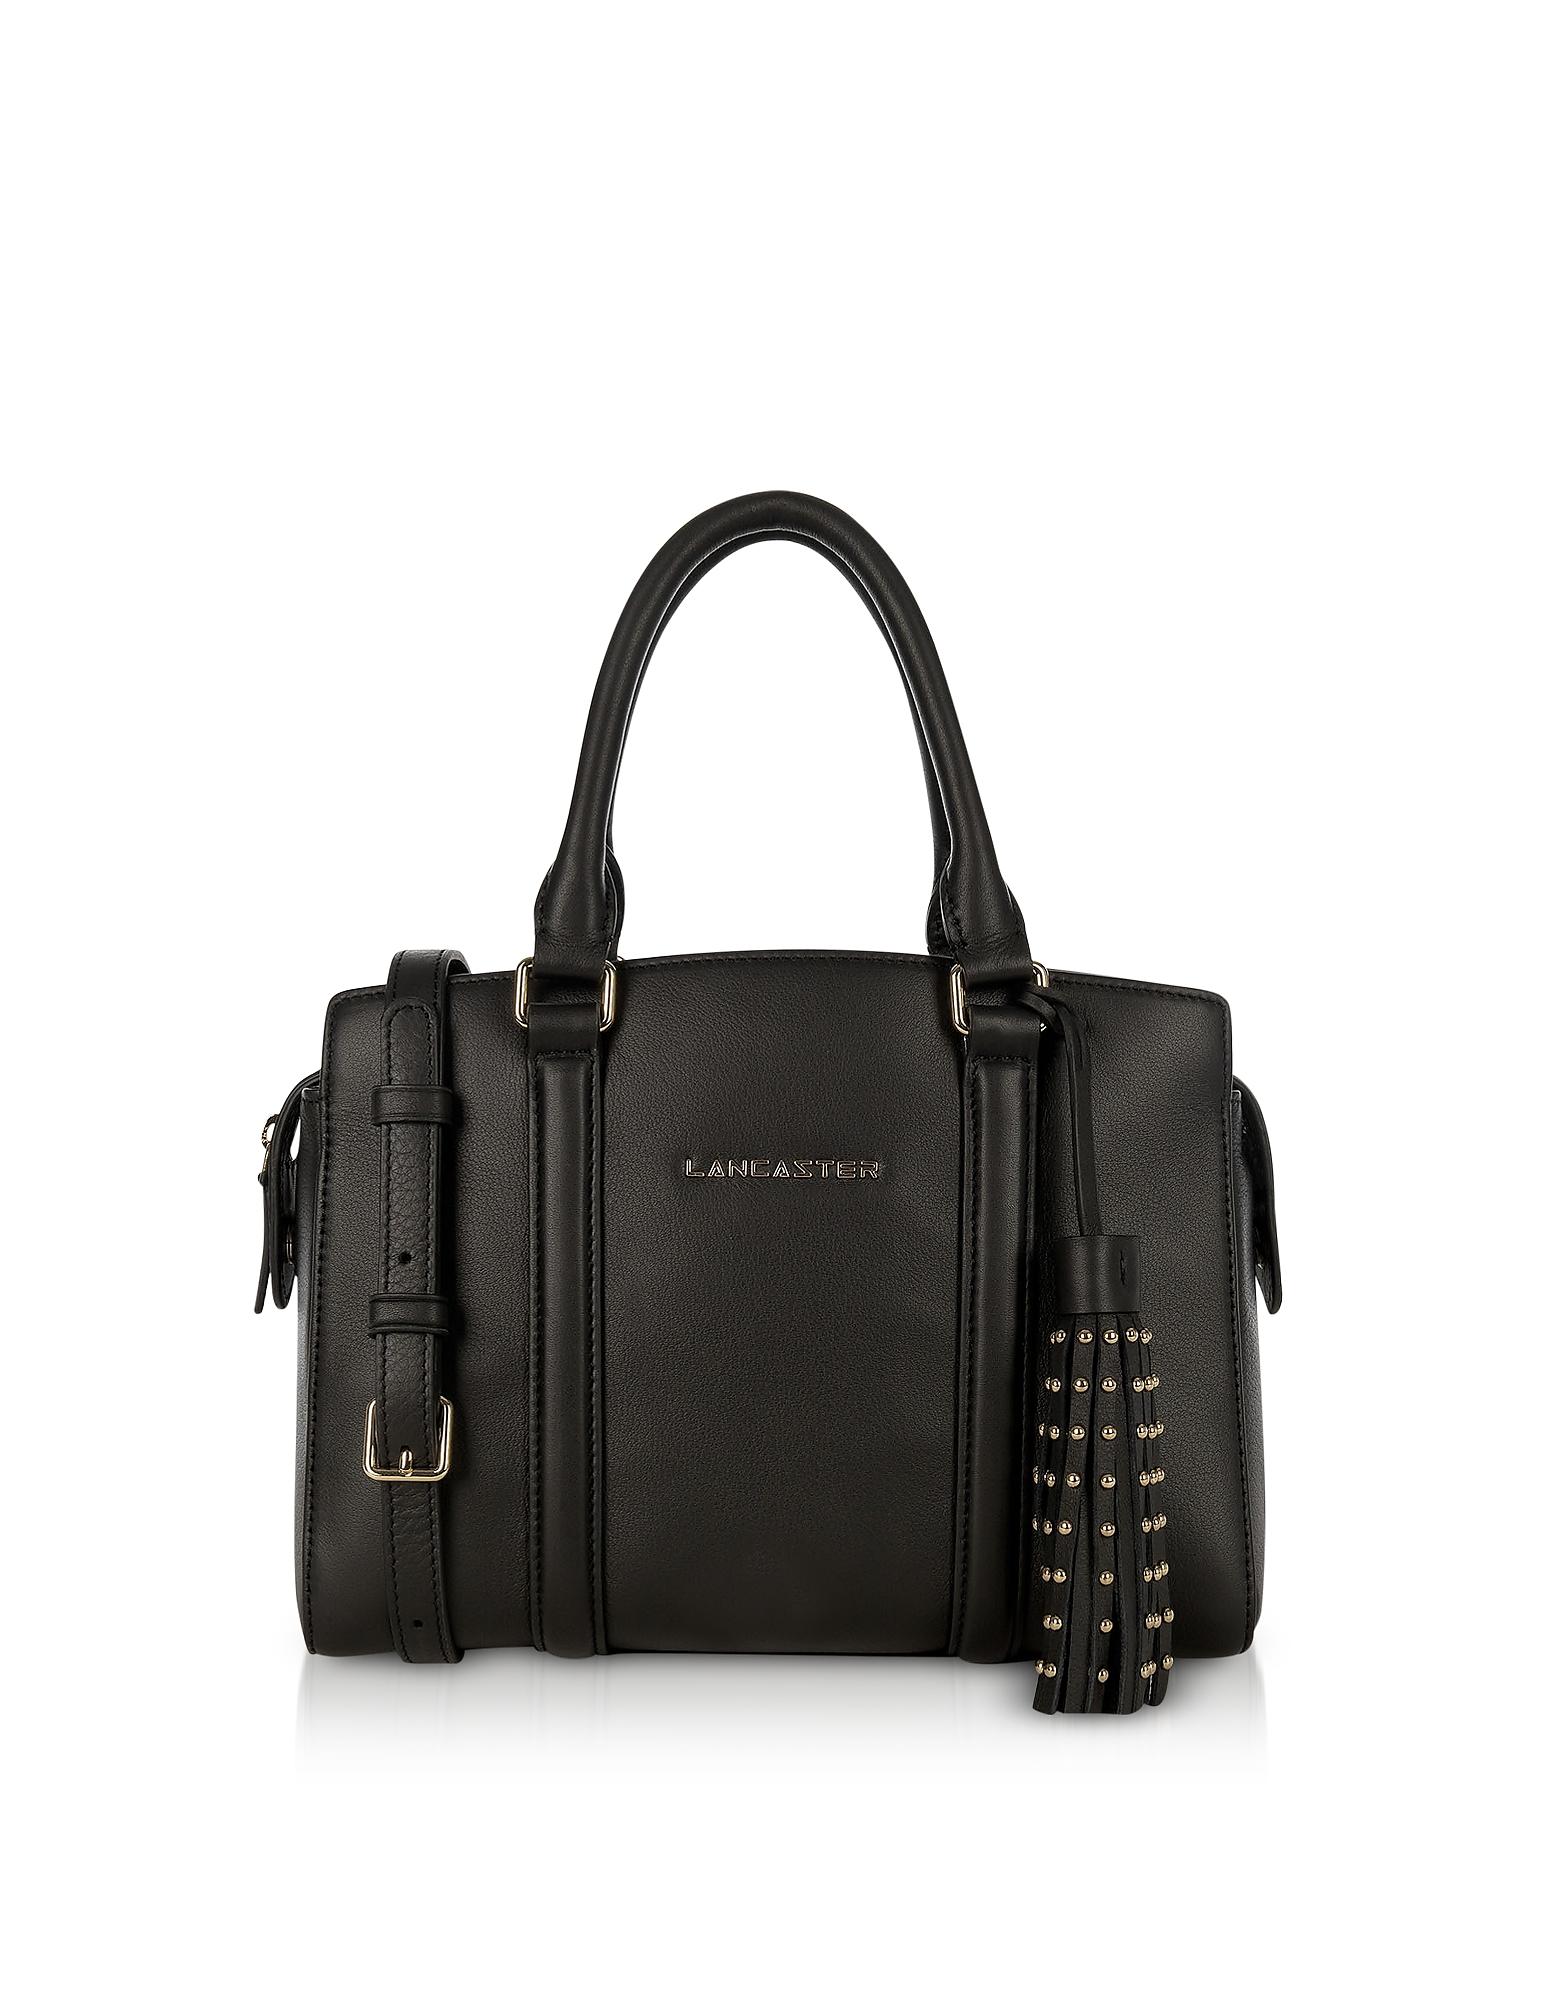 Ana Black Leather Small Tote Bag